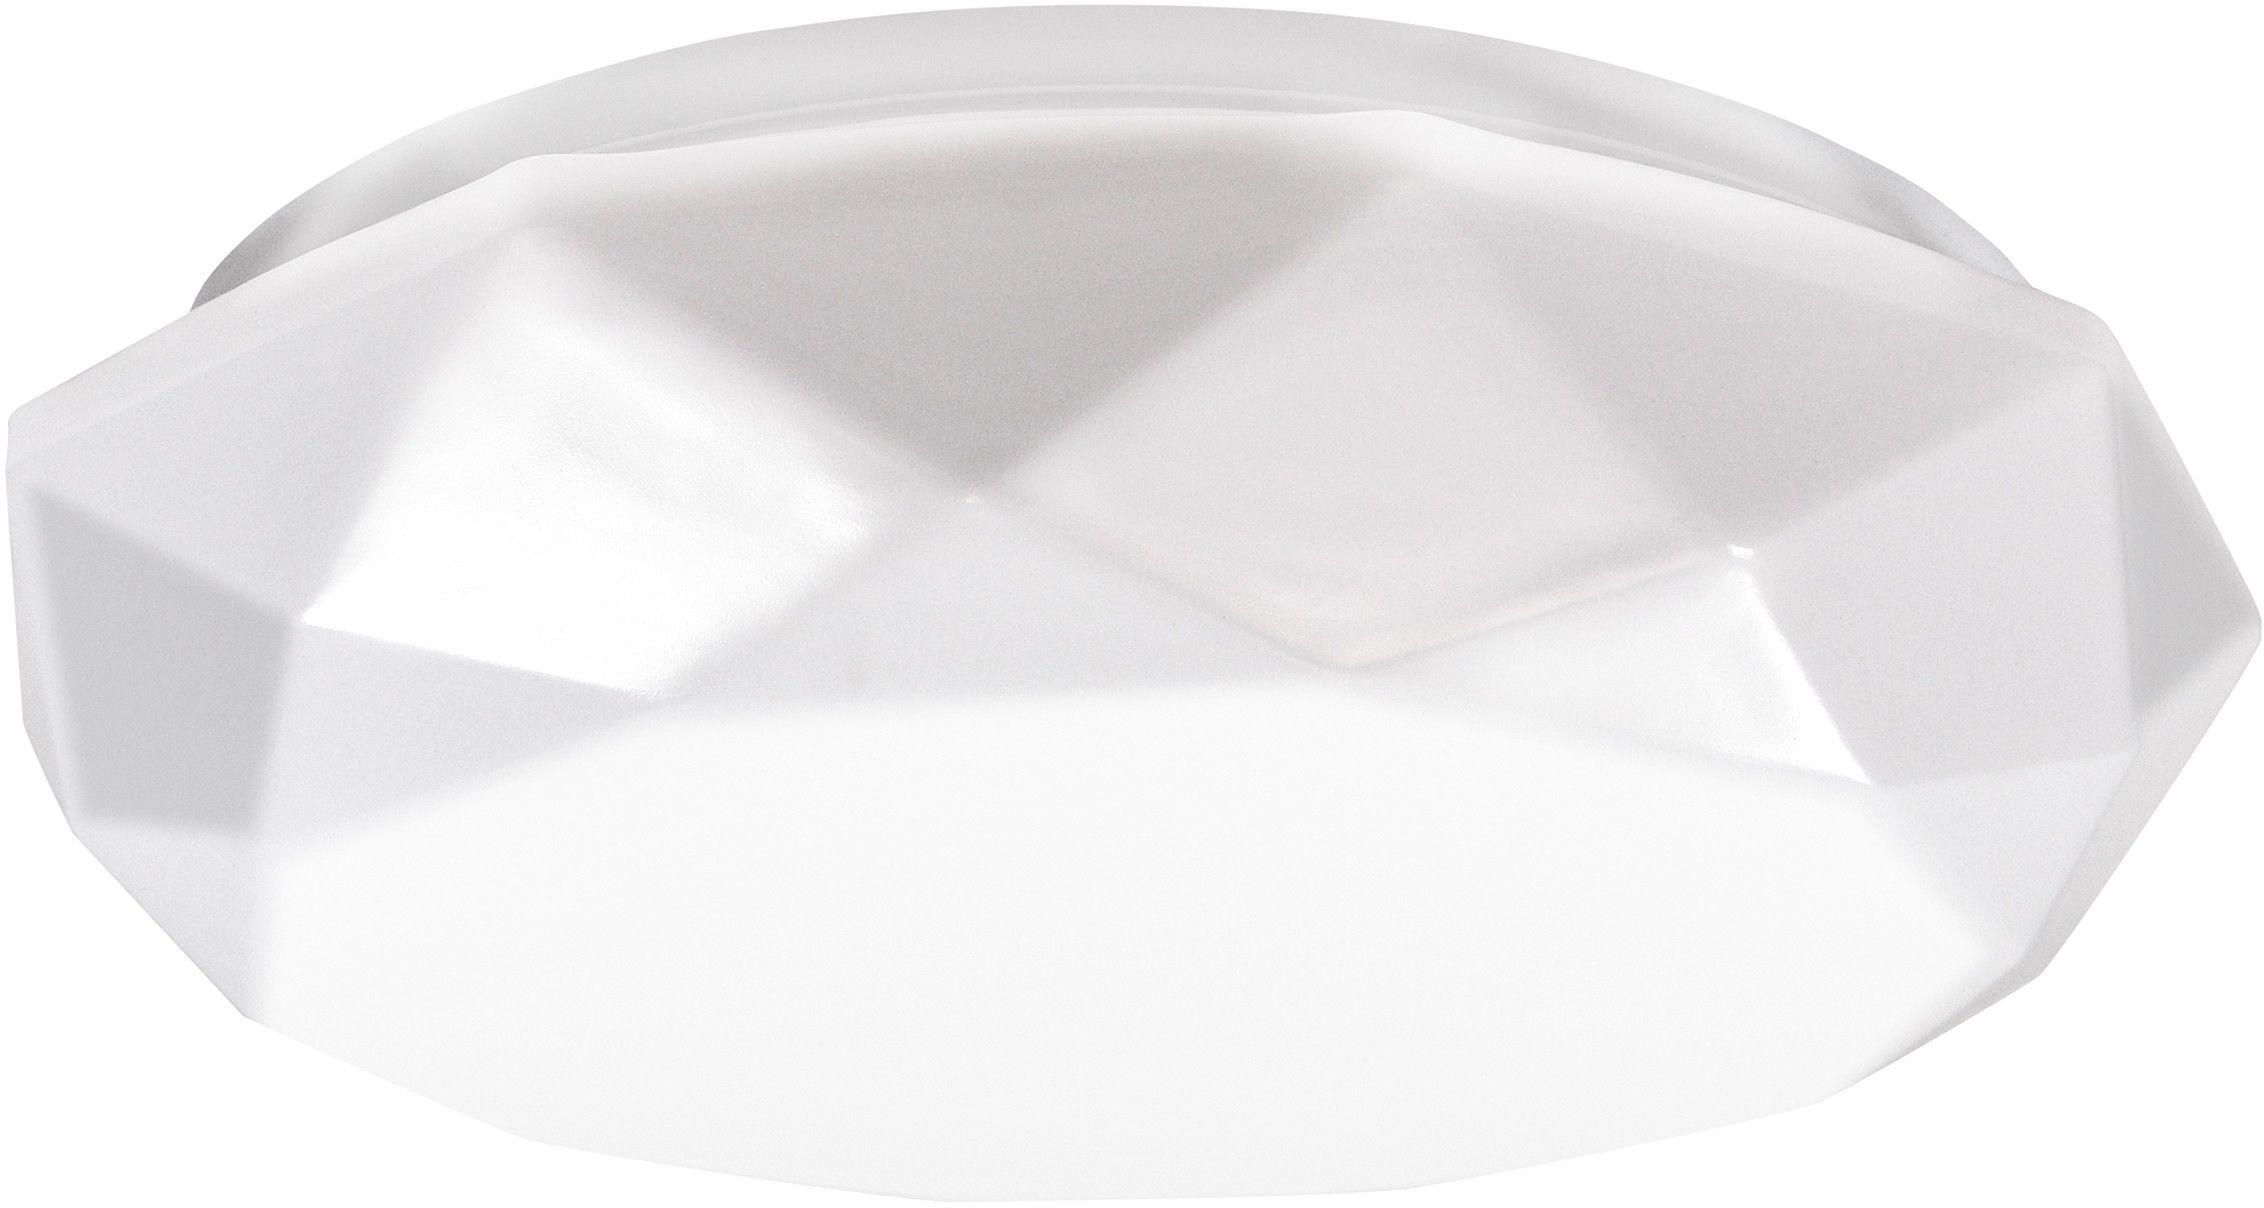 Plafon LED Polux Selina 12 W 900 lm